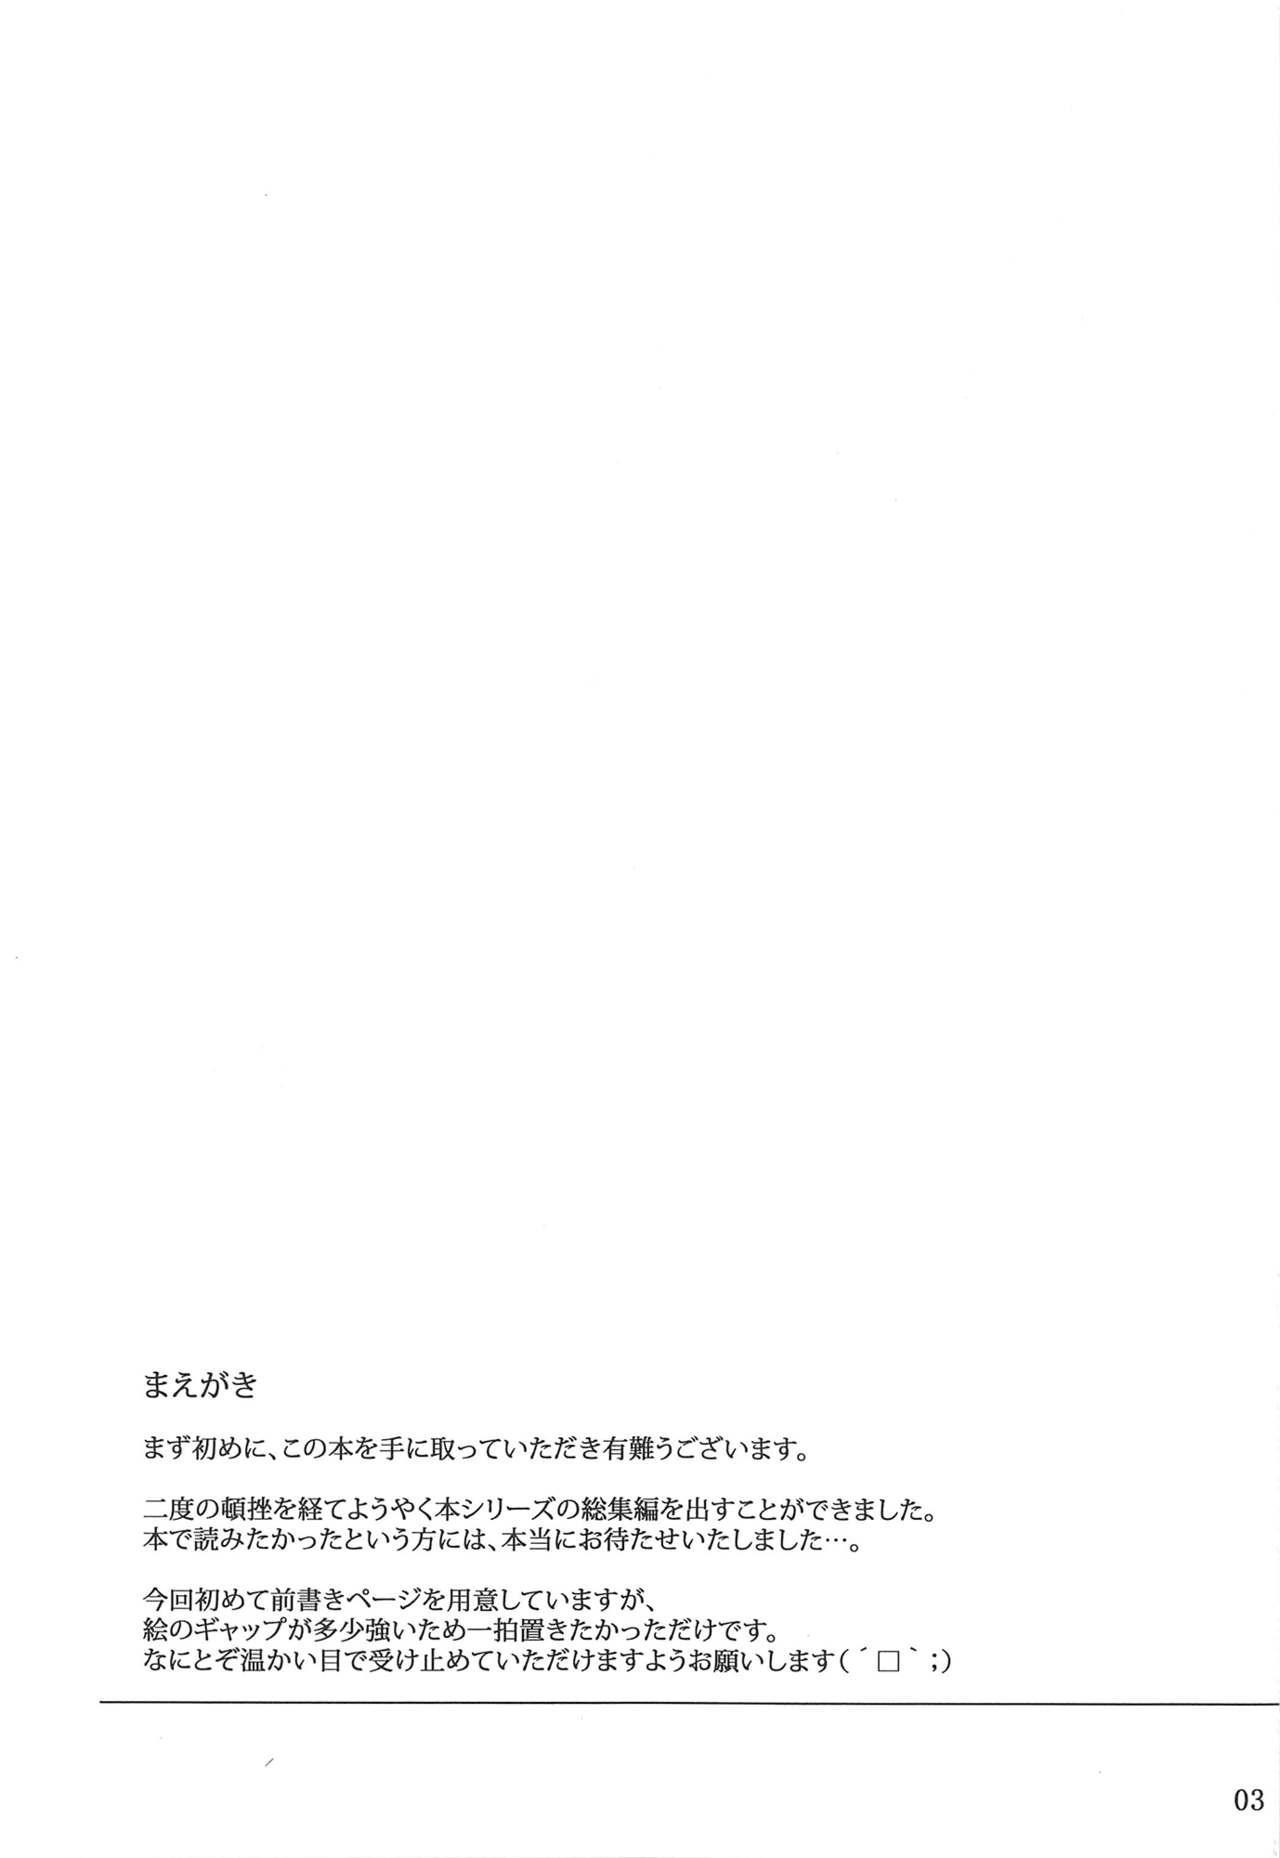 Tosaka-ke no Kakei Jijou Soushuuhen 1 1